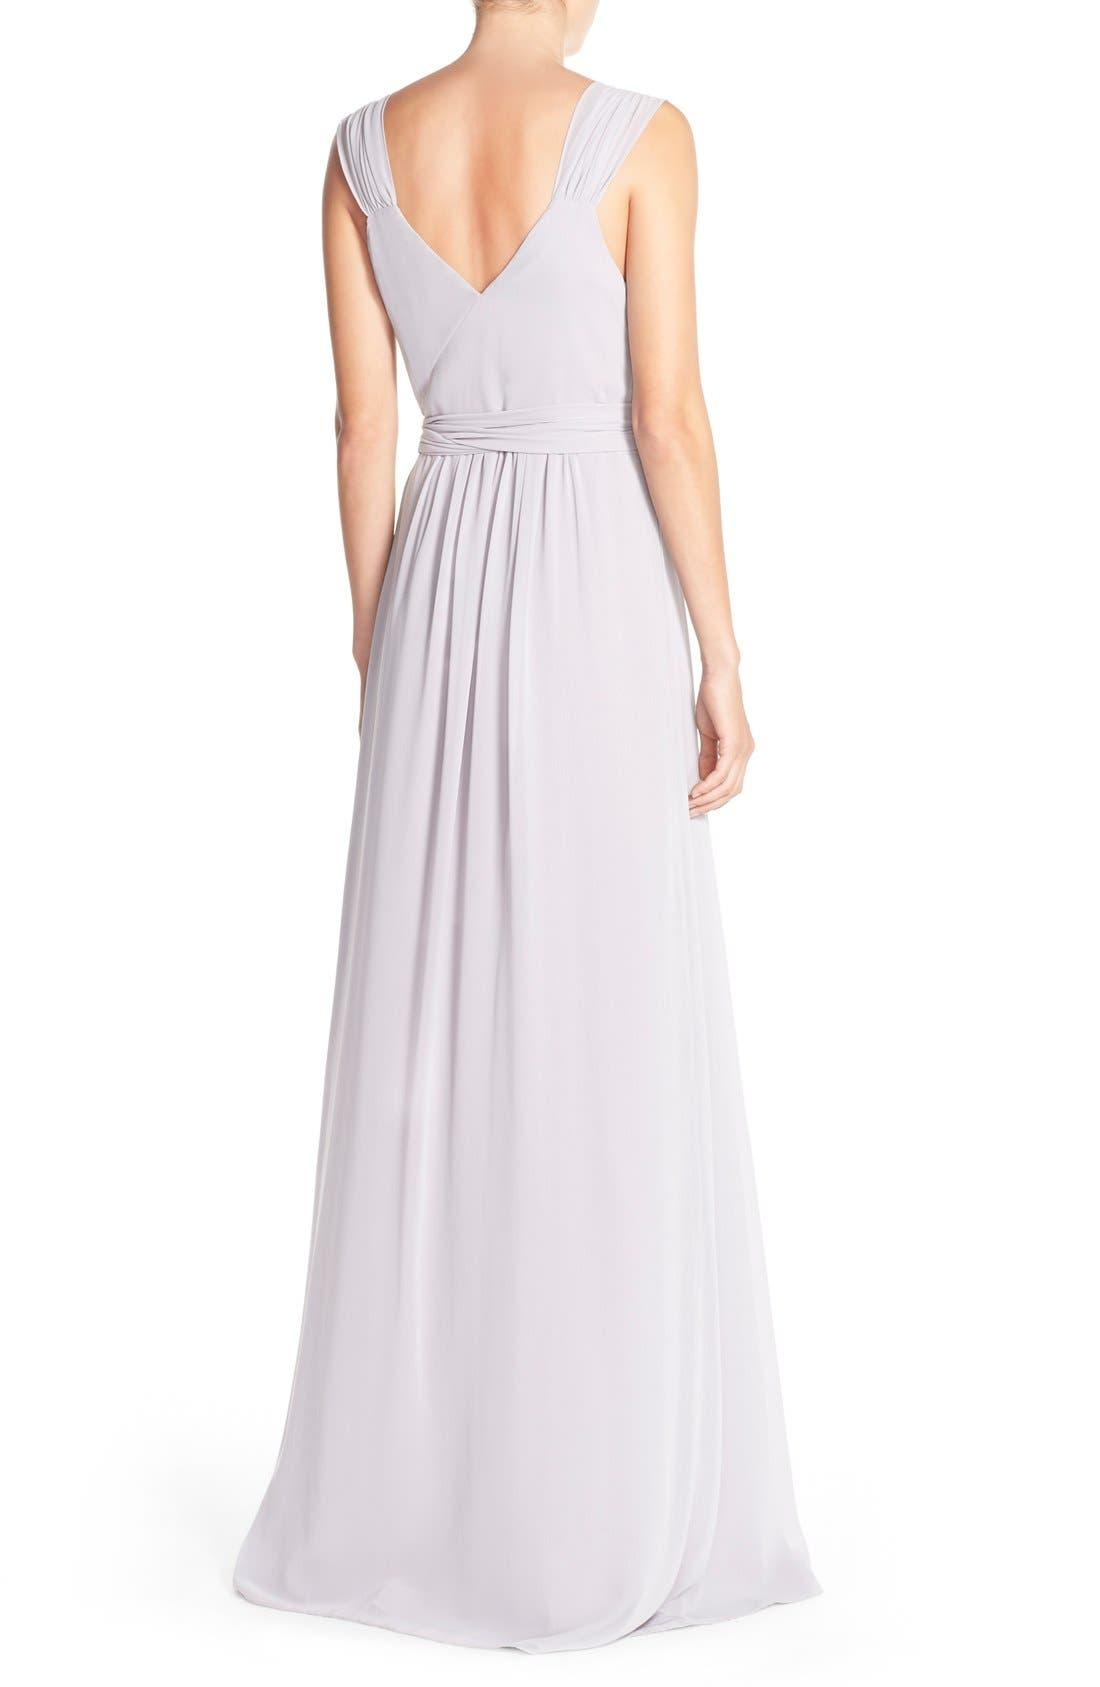 Newbury Gathered Sleeve Chiffon Wrap Gown,                             Alternate thumbnail 19, color,